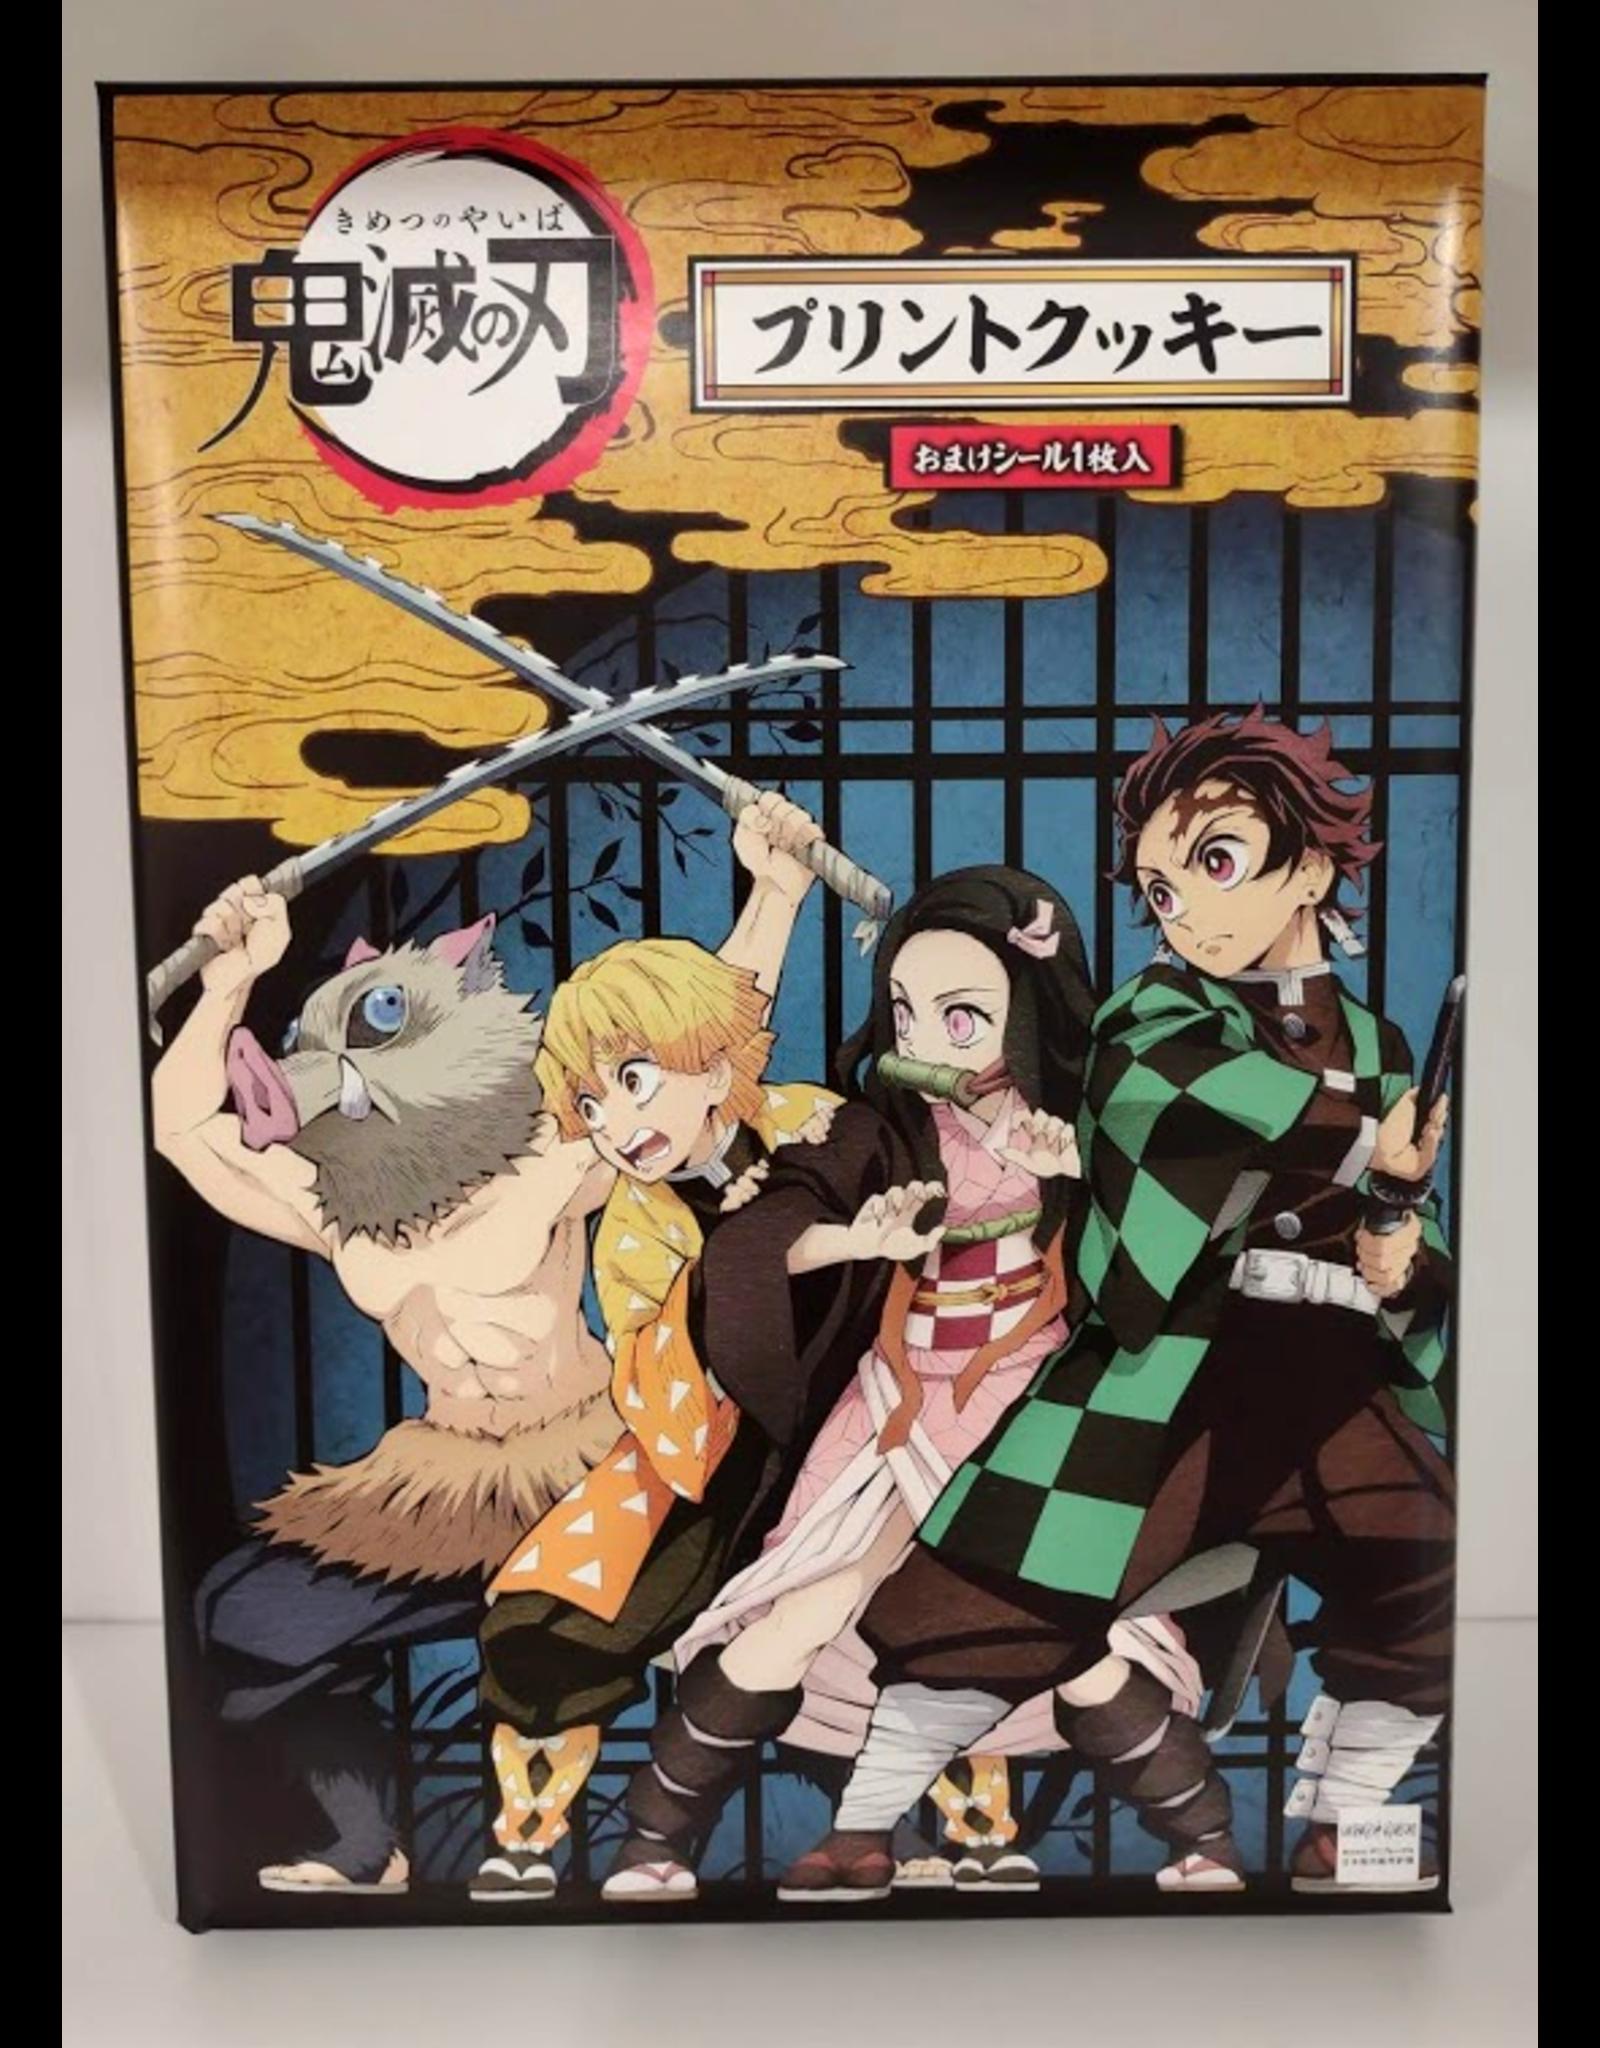 Demon Slayer: Kimetsu no Yaiba - 4 Character Sand Cookies Gift Box - 216 g